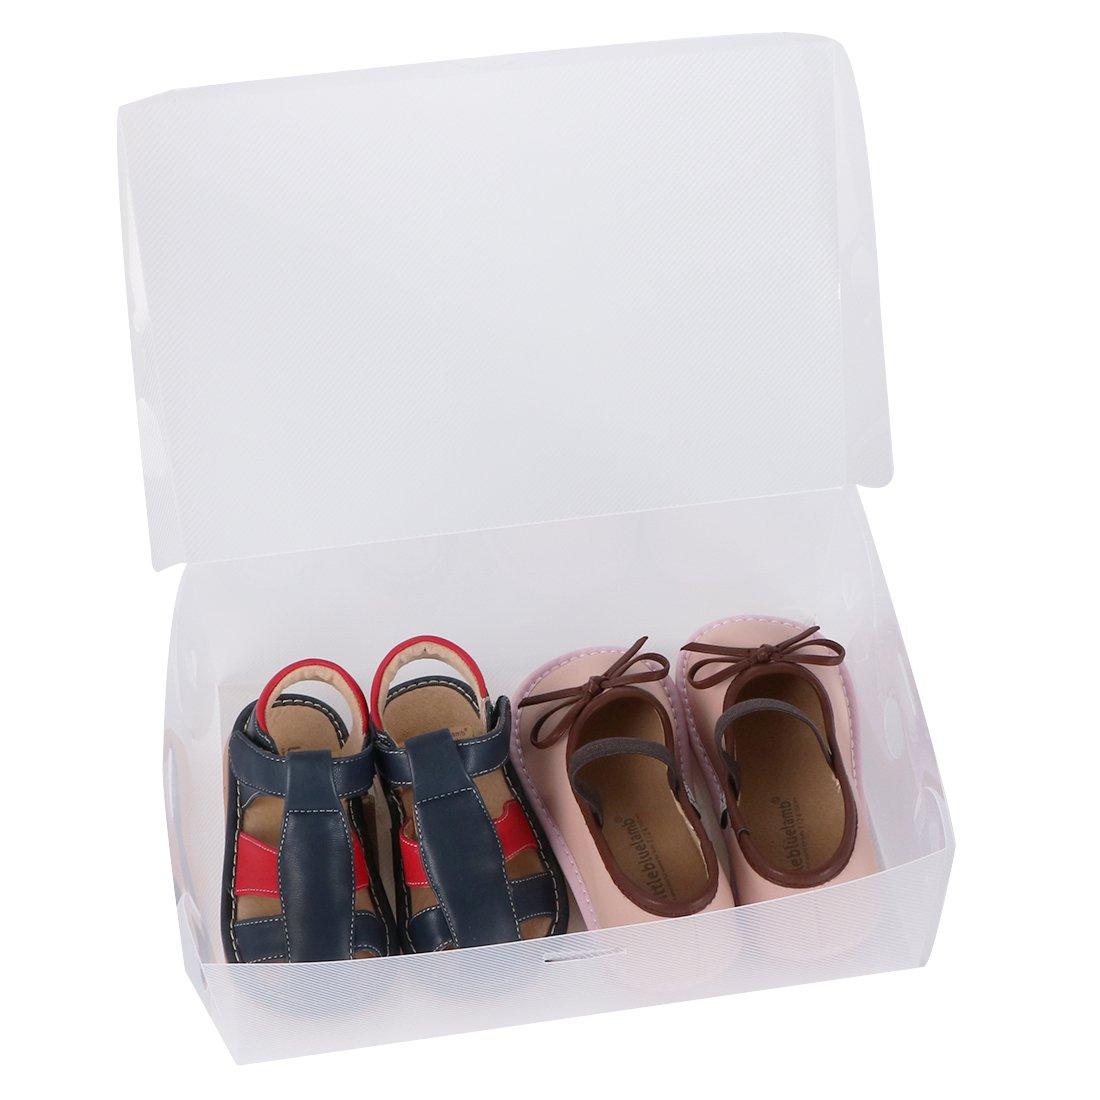 kilofly 15 Kids Women Smart Storage Containers Foldable Clear Shoe Box Set TRTAZ11A Small